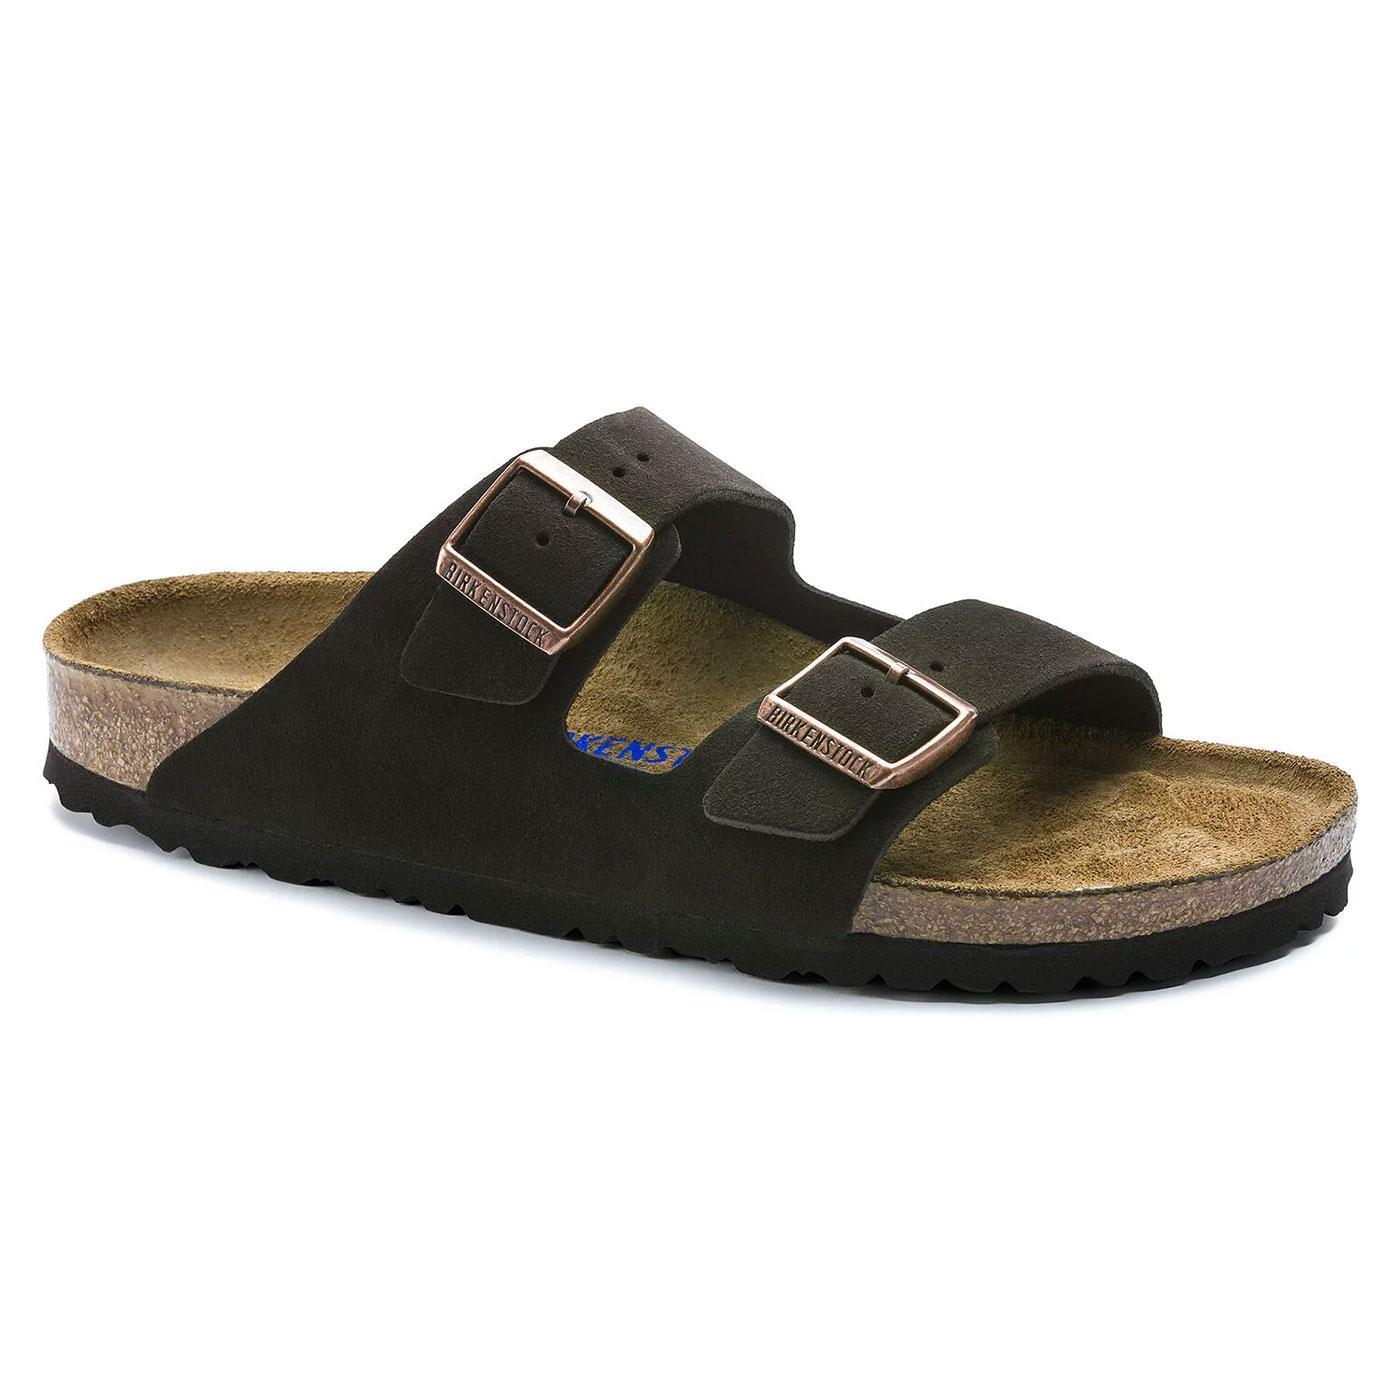 Arizona BIRKENSTOCK Soft Footbed Suede Sandals (M)